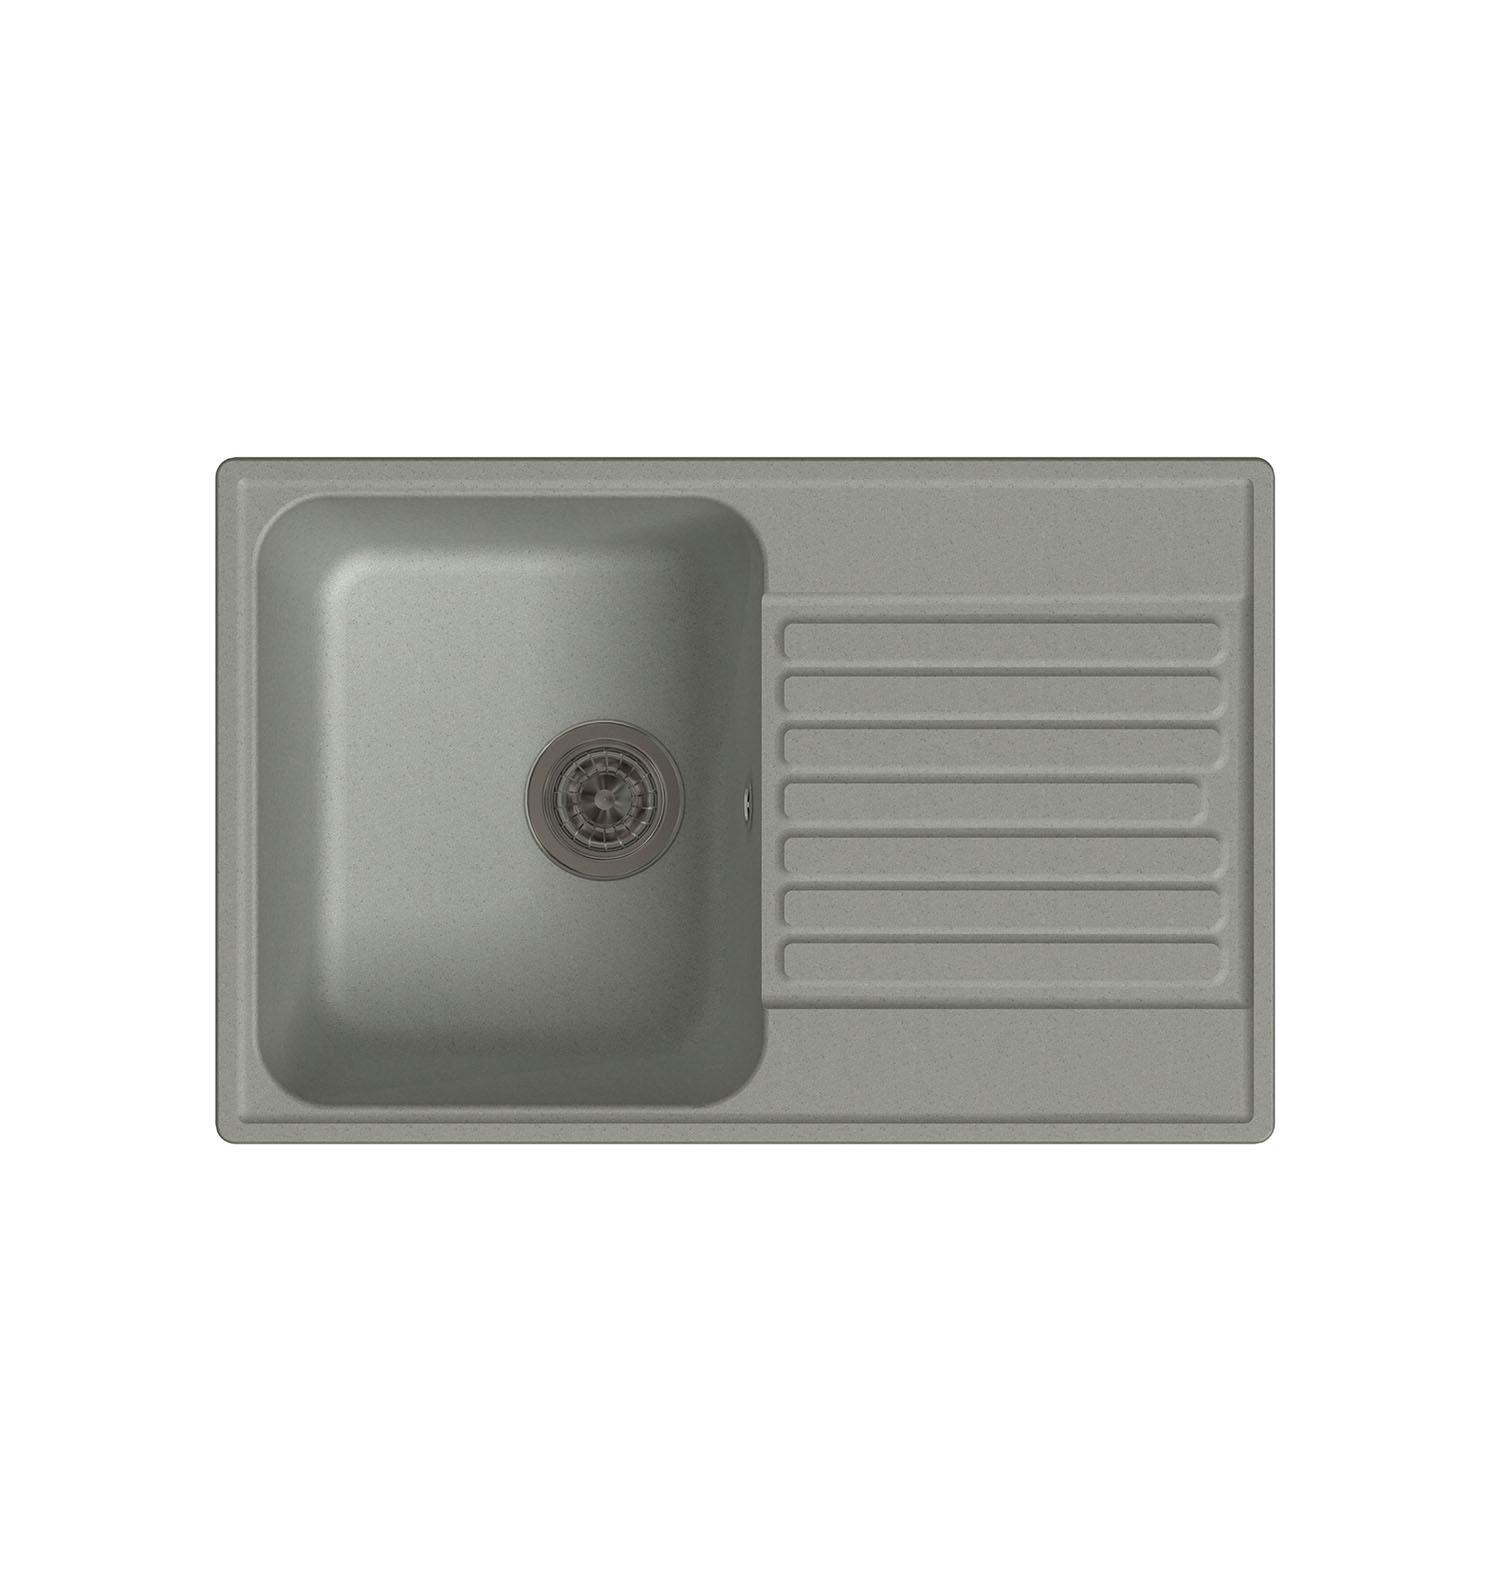 LEX Geneva 740 Space Gray